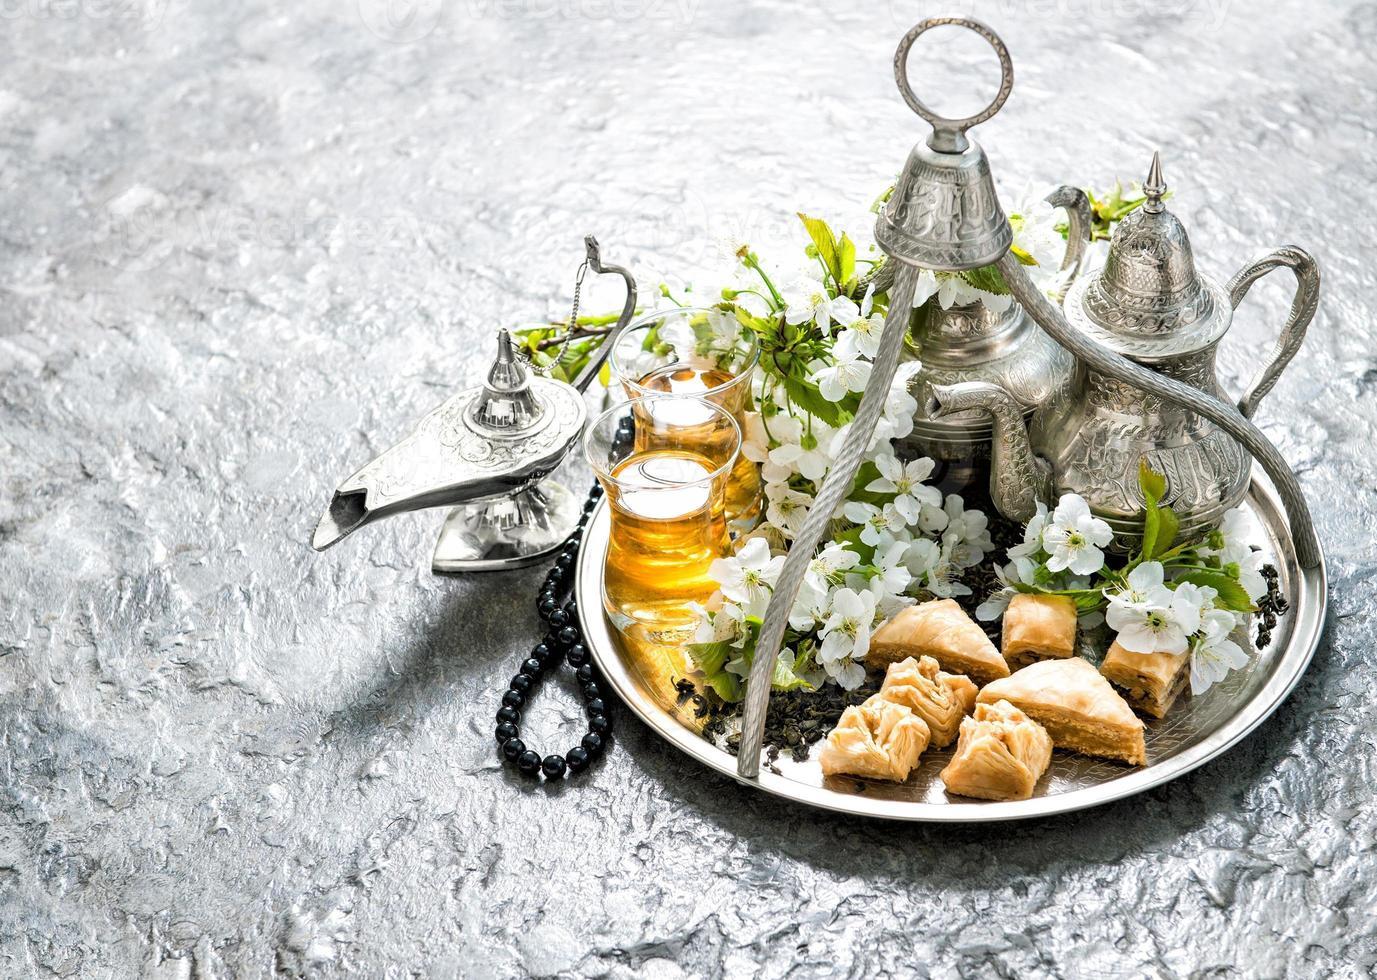 tekanna och glas, godis. islamiska helgdagar. hari raya aidilfitri foto